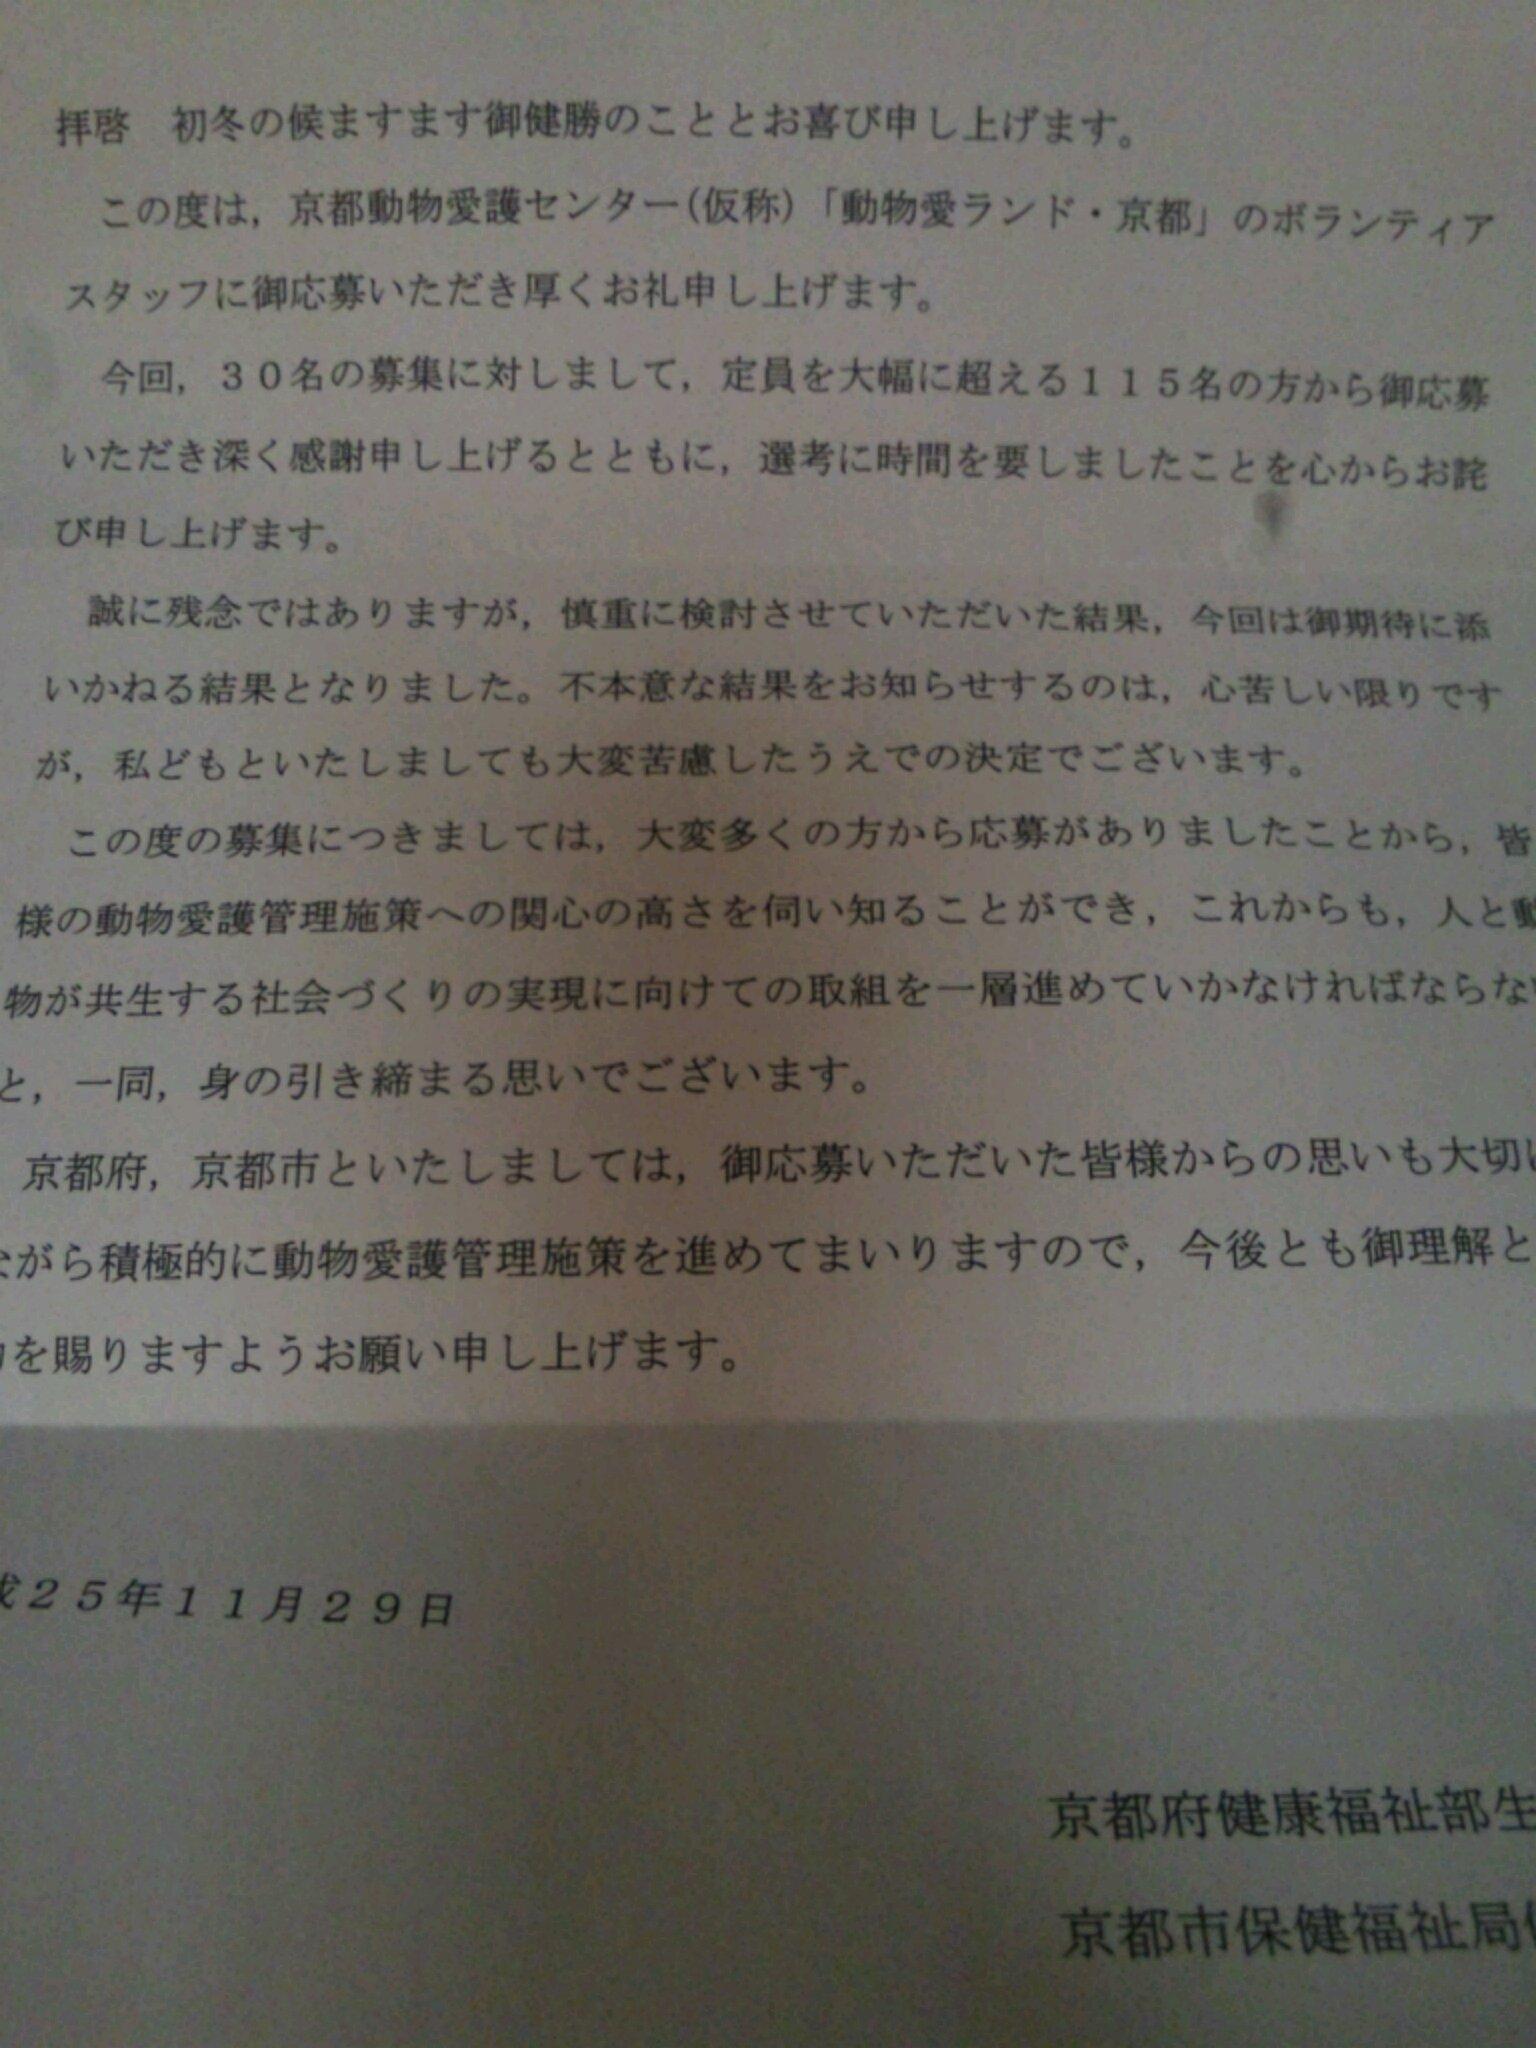 kyotoD.jpg